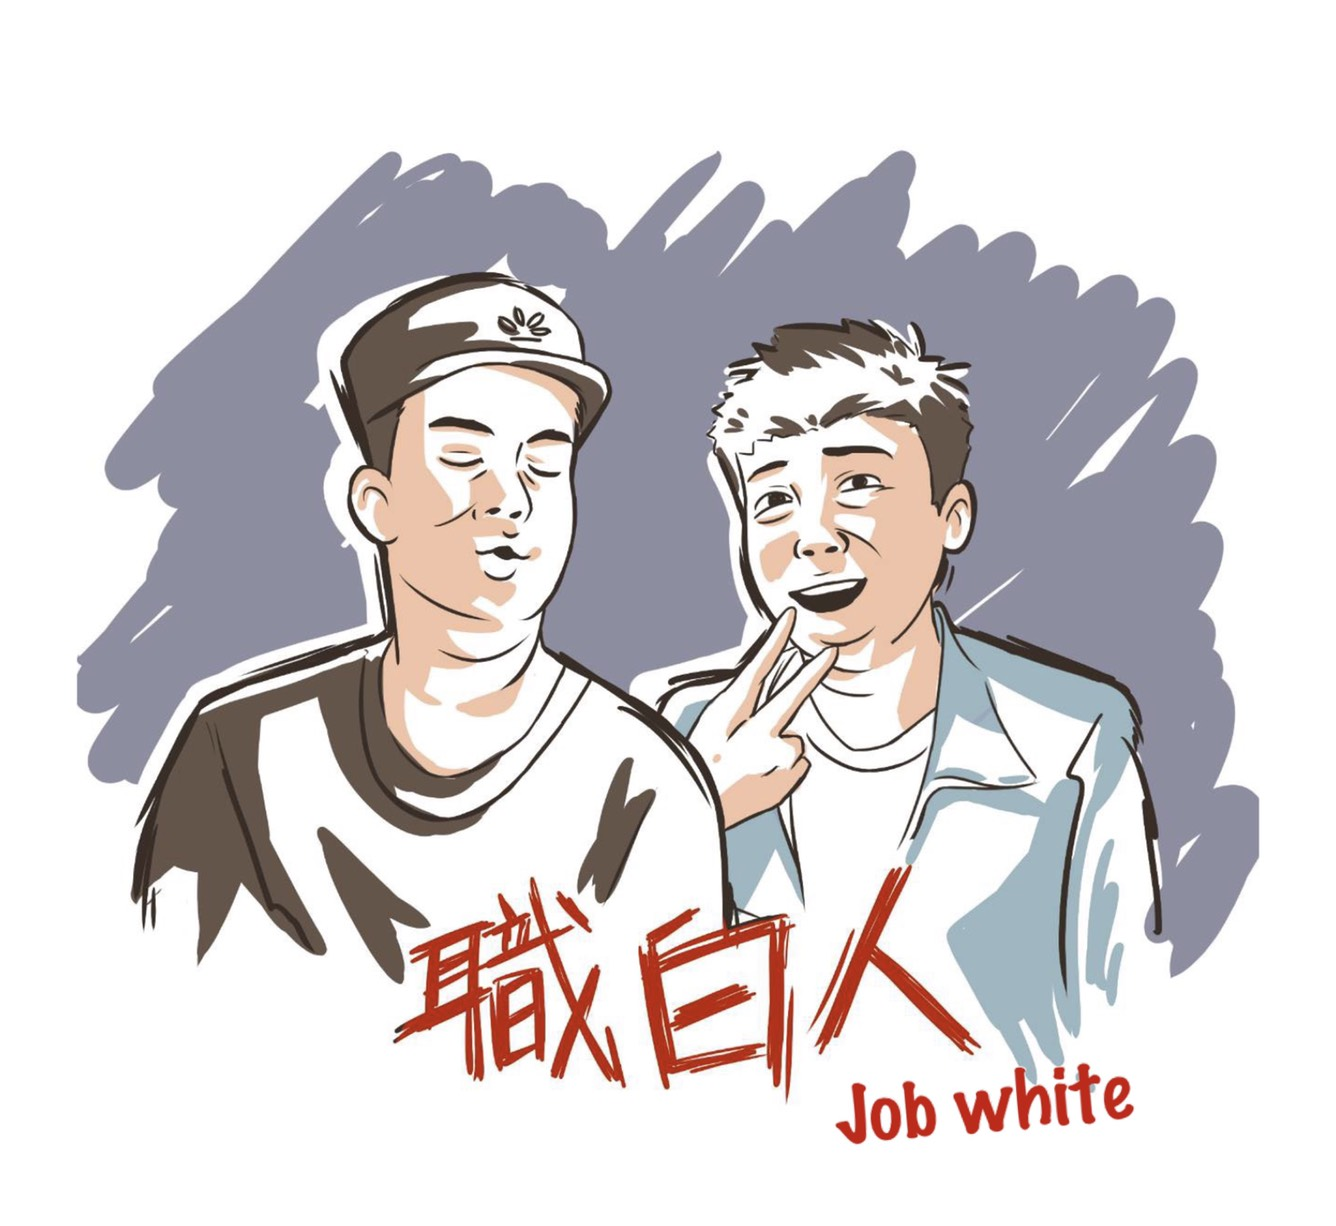 EP8  劇組幕後的保母,你是小叮噹嗎?  ft.高雅【Job white 職白人】